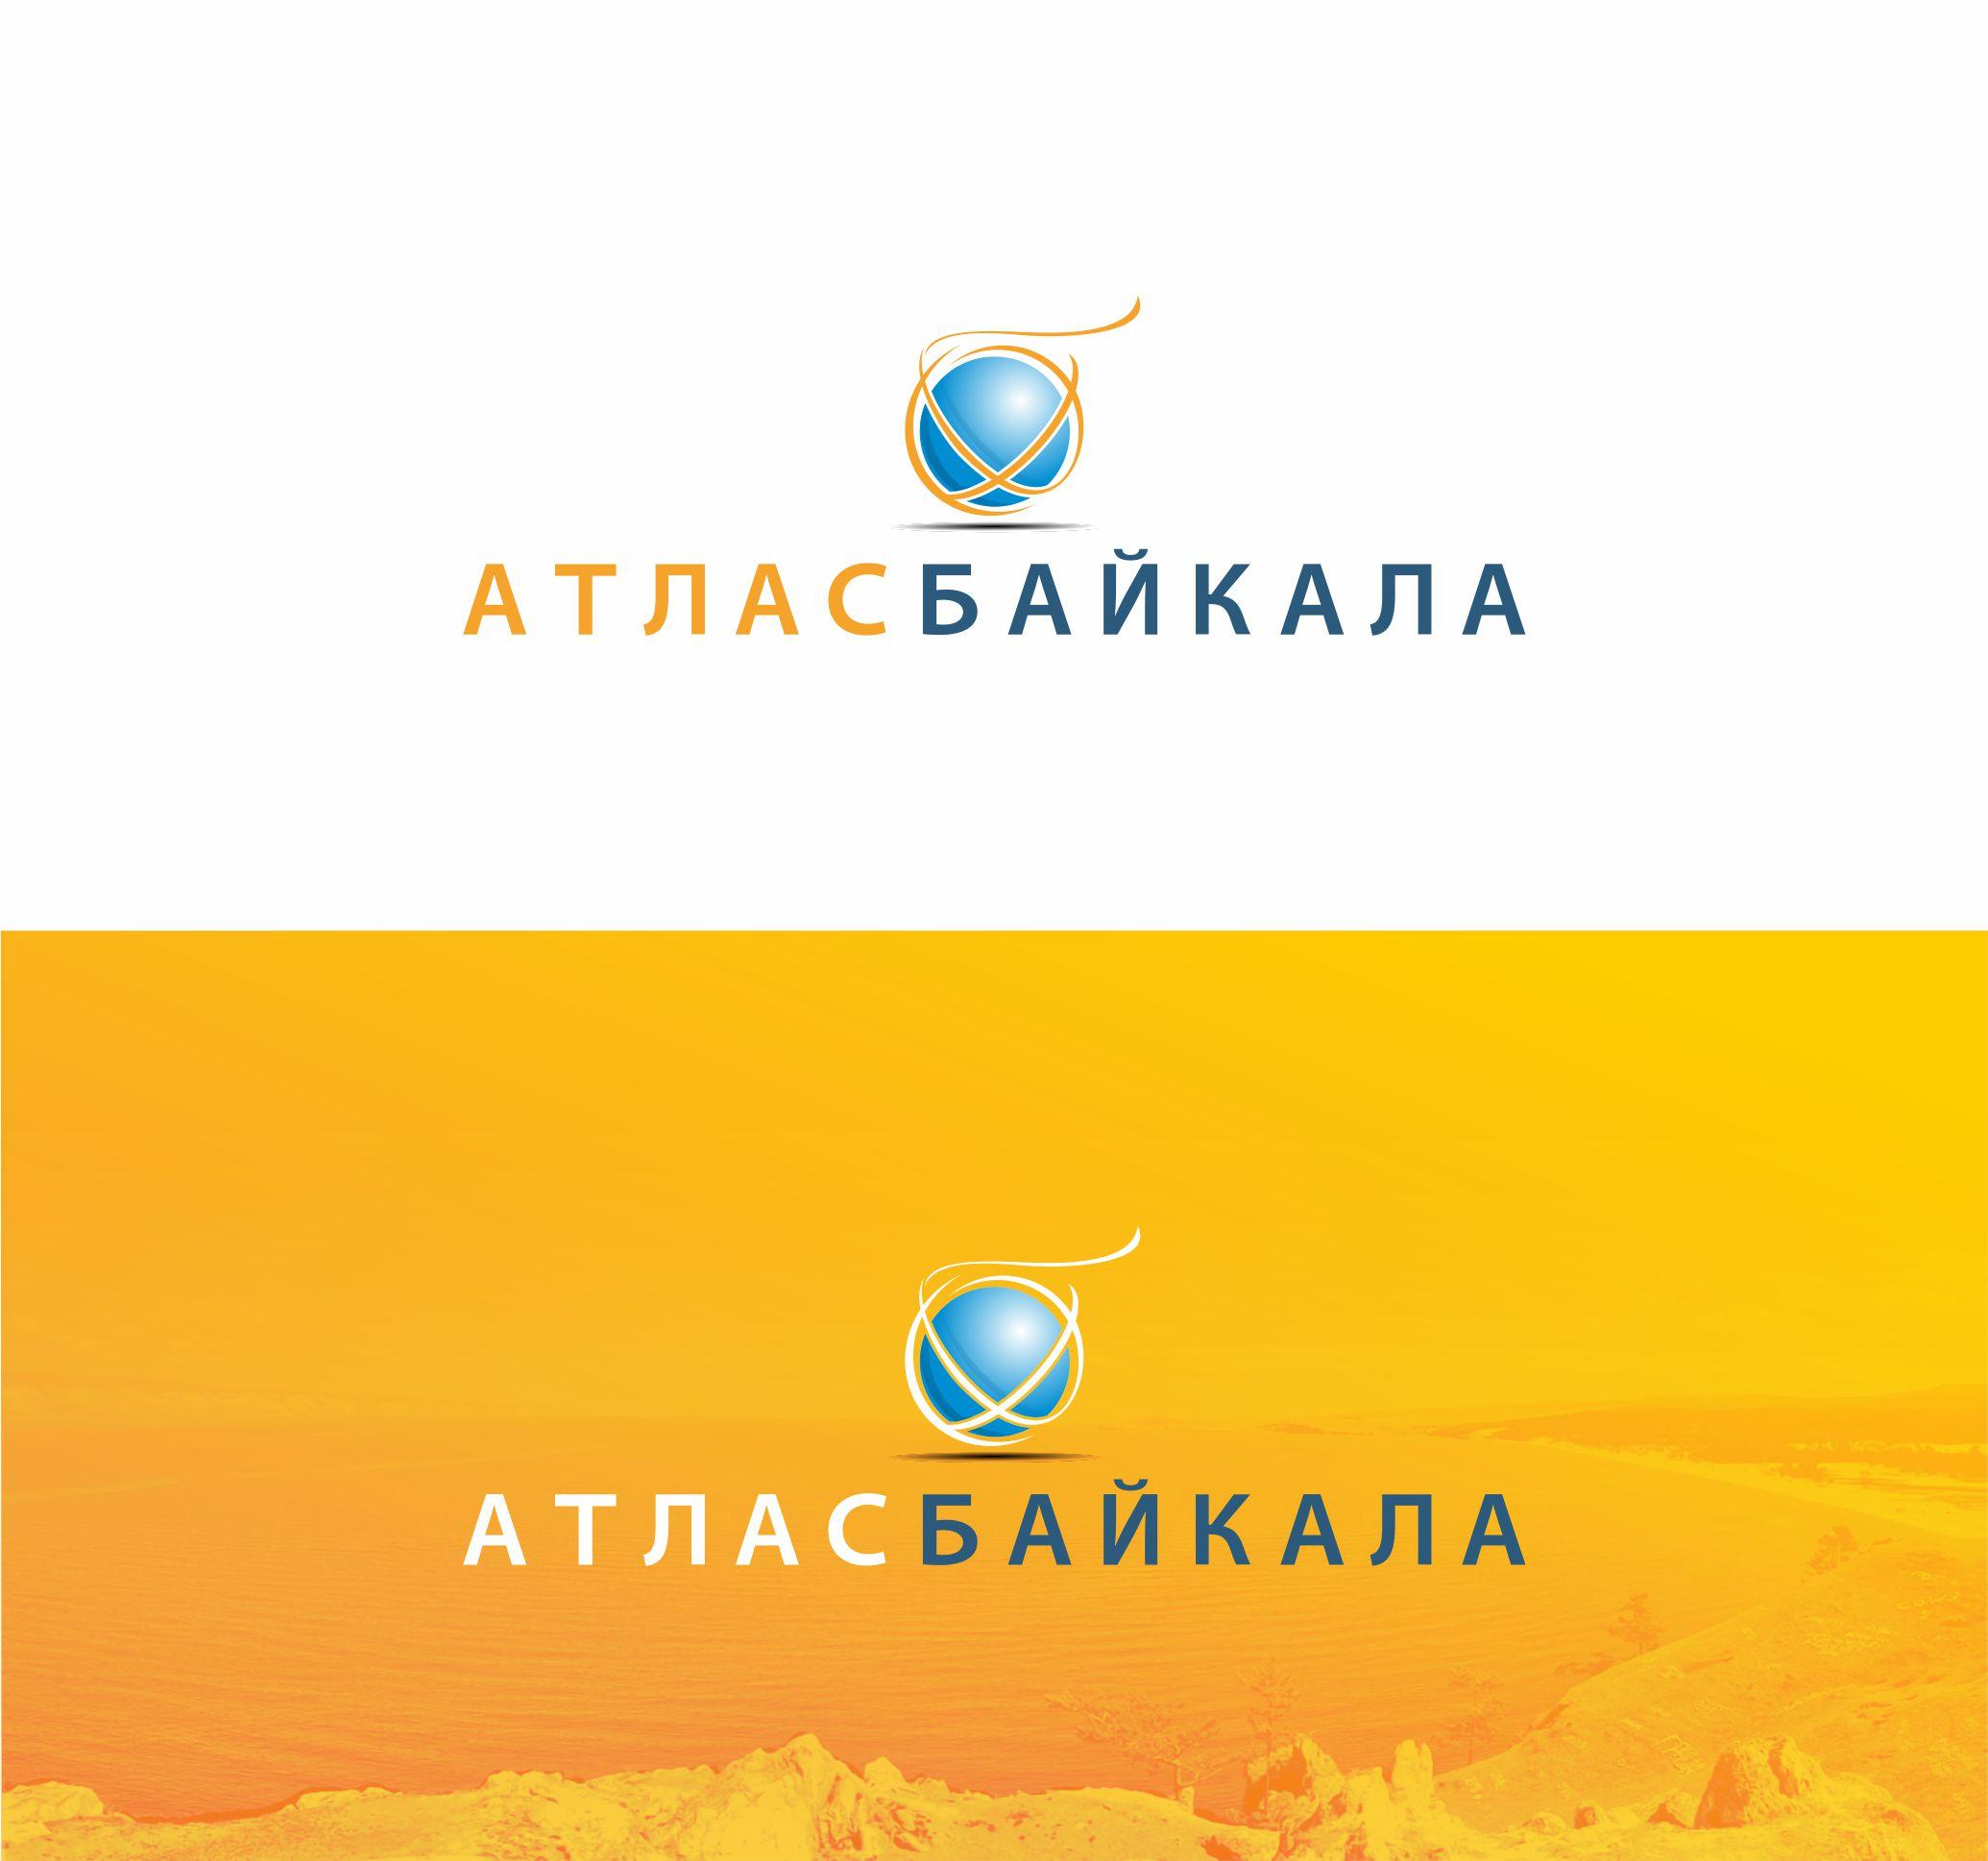 Разработка логотипа Атлас Байкала фото f_4105afc8e43d0ed9.jpg